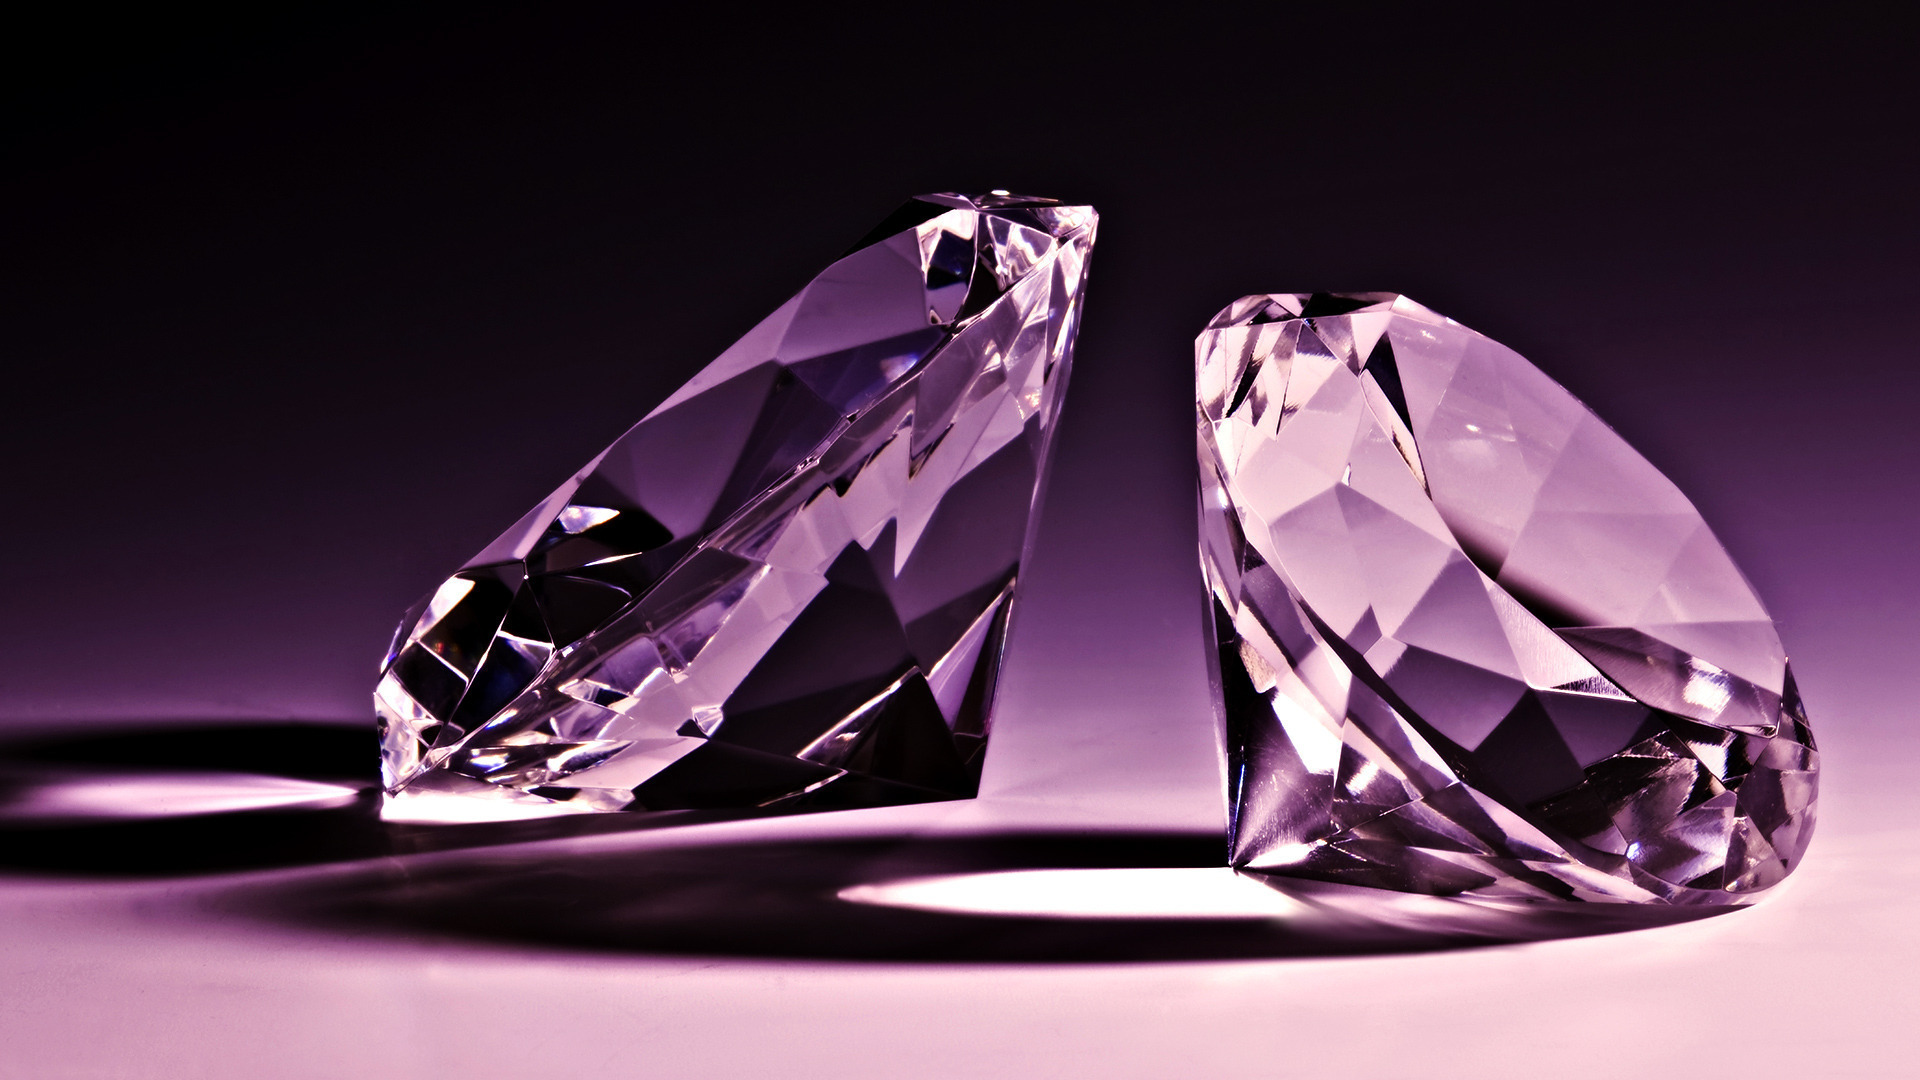 Бриллиант - обои на рабочий стол 1920x1080 №1088808